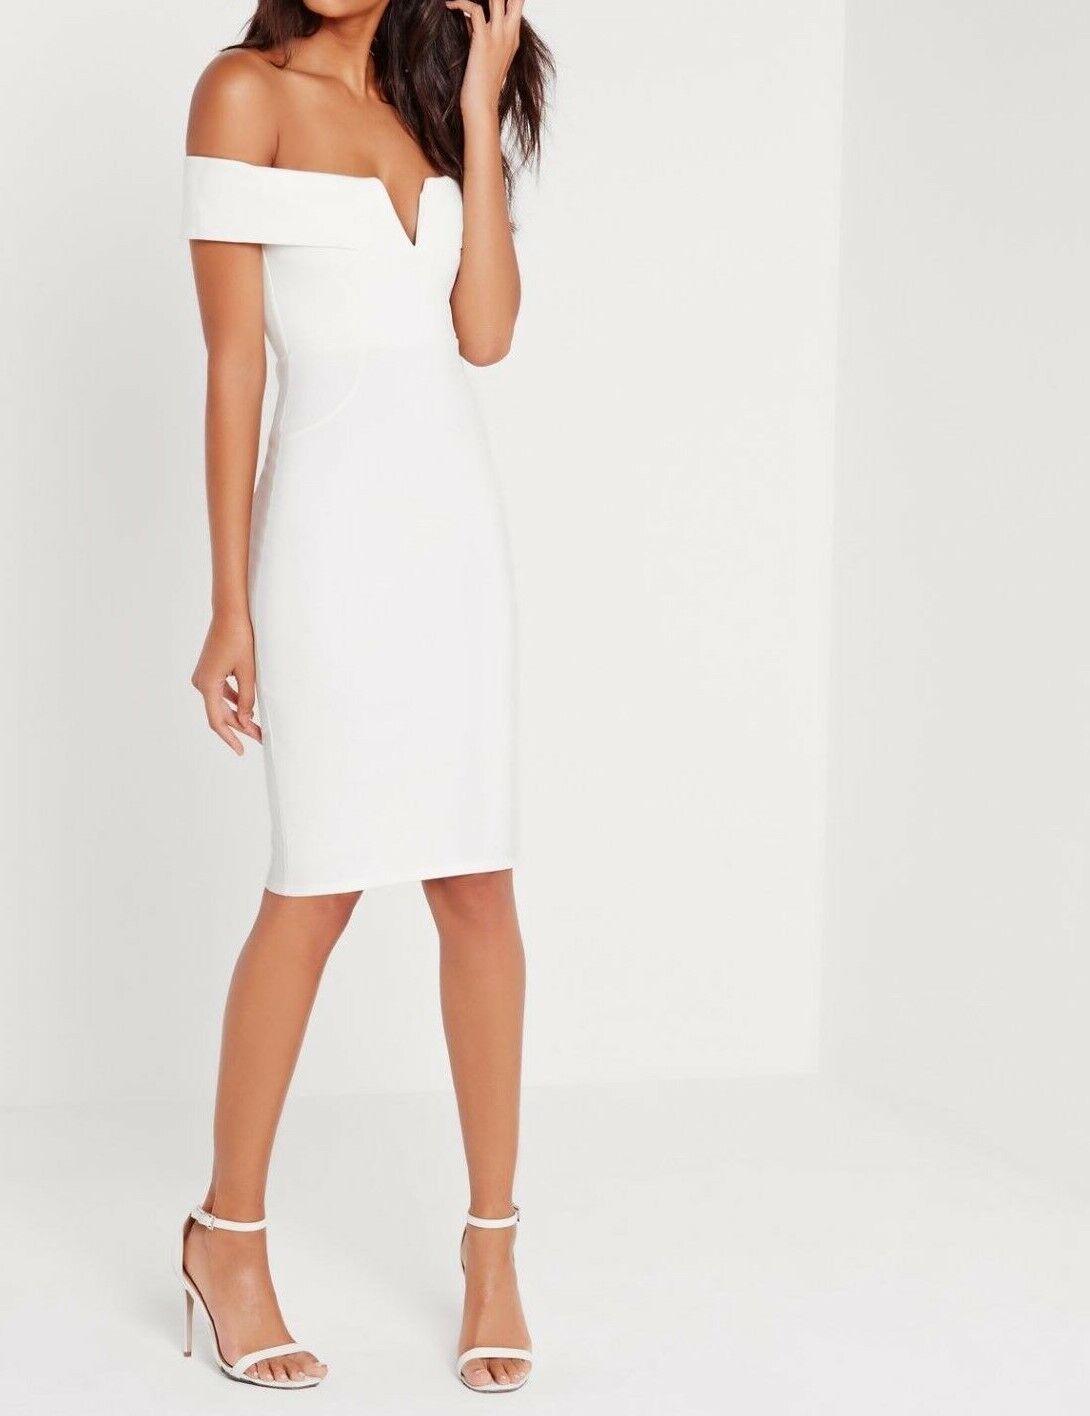 Missguided V Front Bardot Vestito Attillato Bianco Bianco Bianco Noi 8 Eu 40 (Camg163.1) e2b274